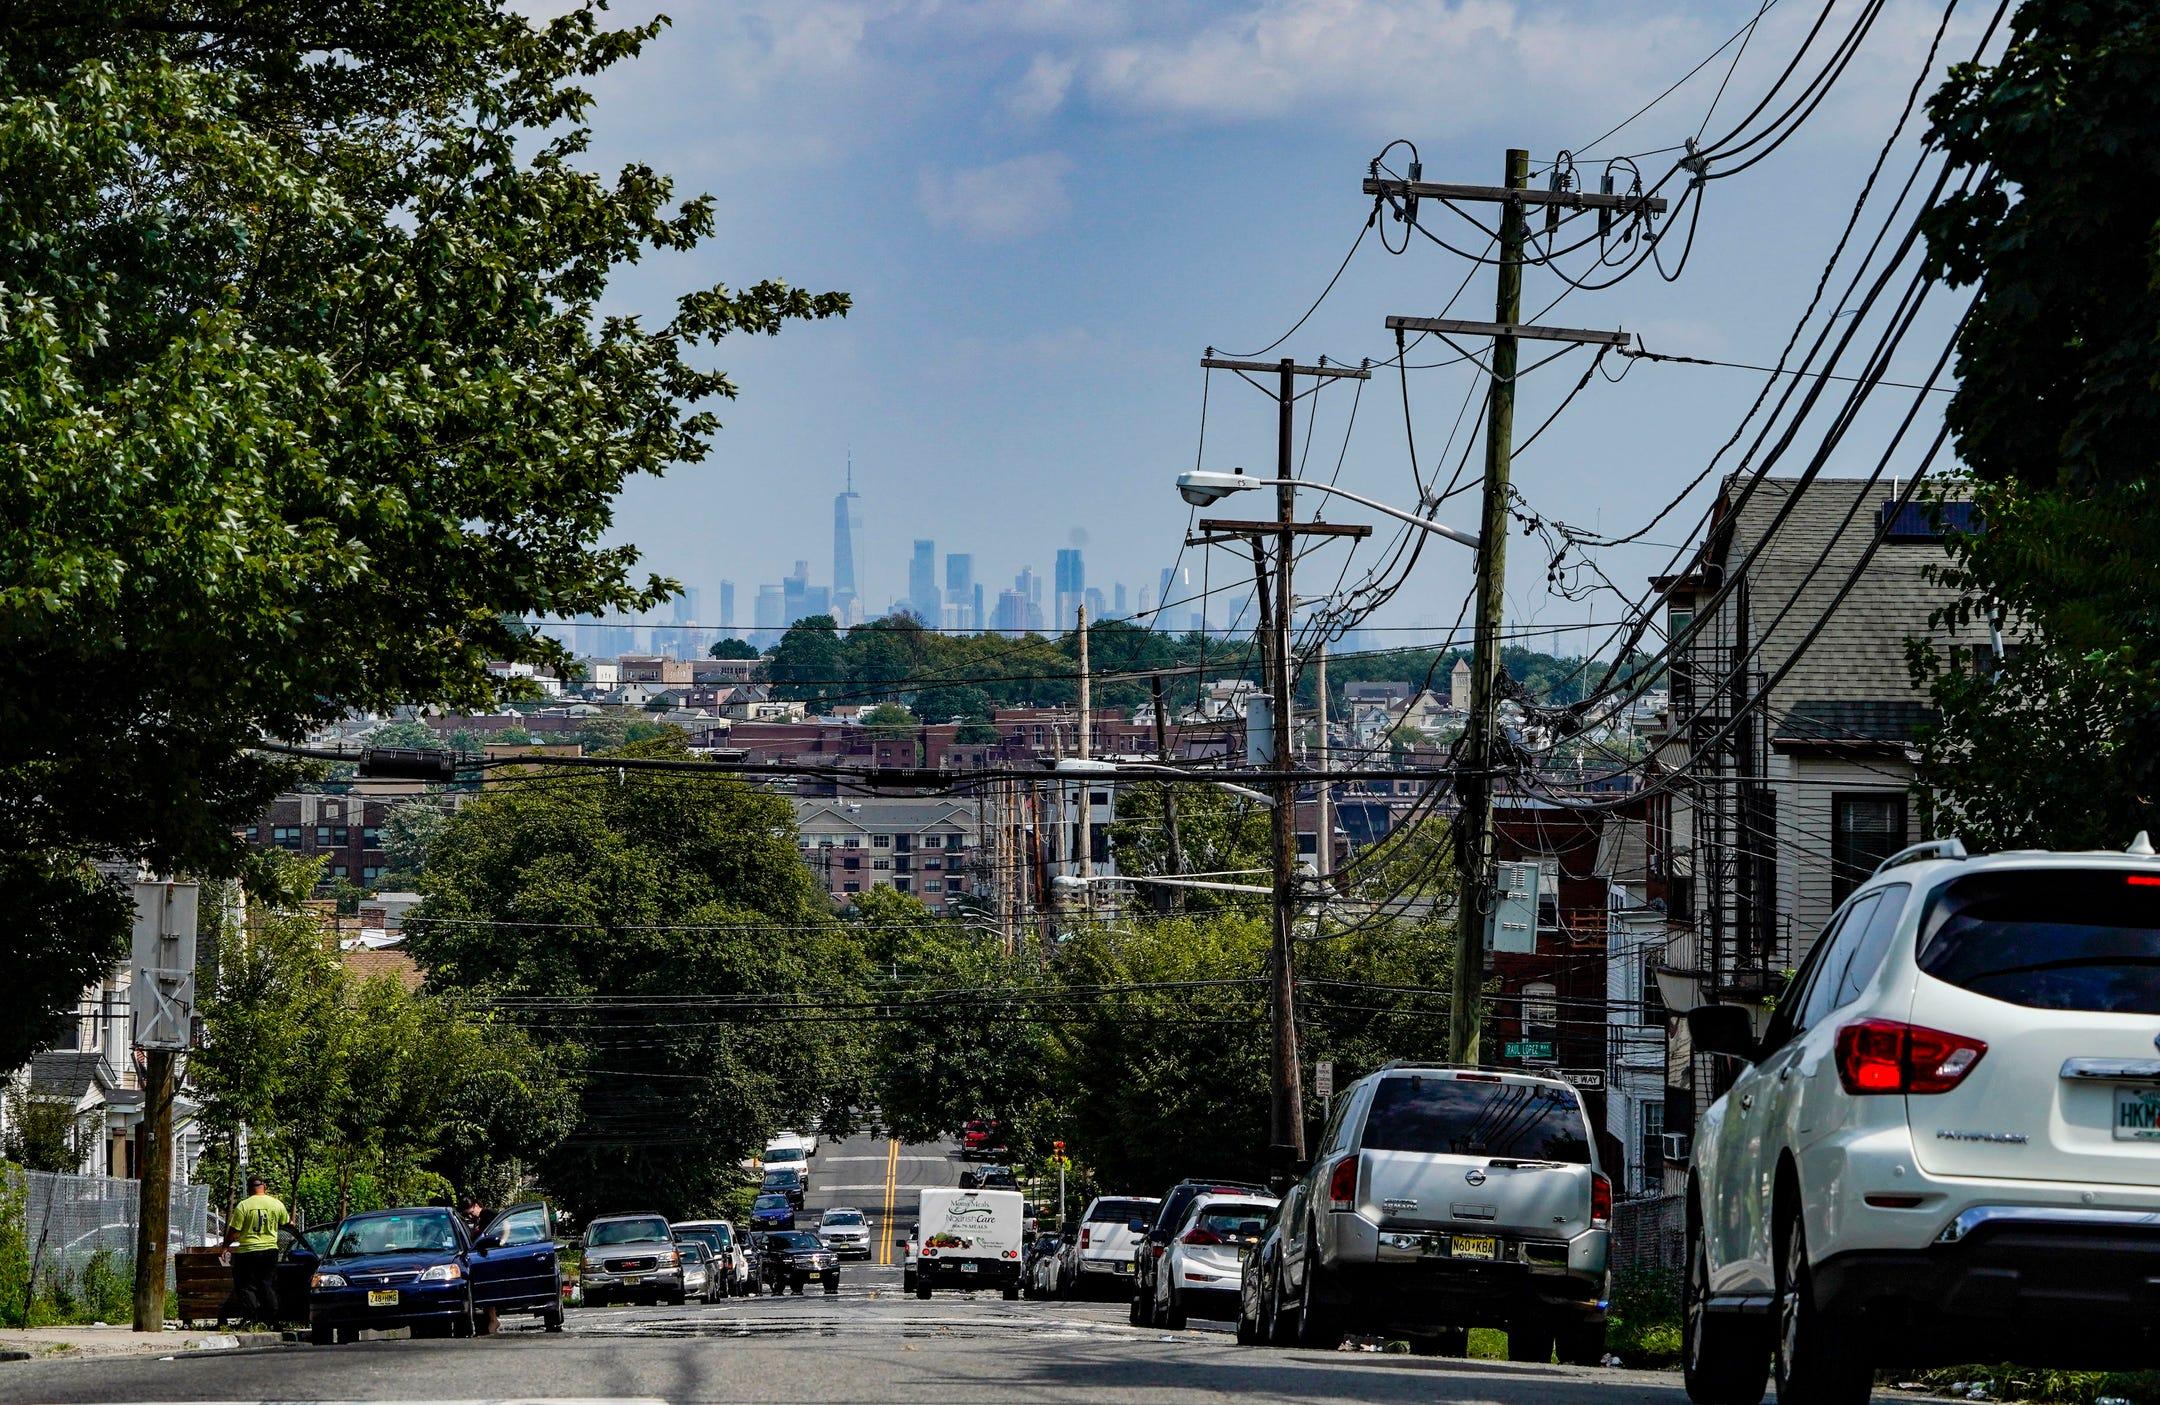 Covid Segregation Is Killing Black Americans In New Jersey